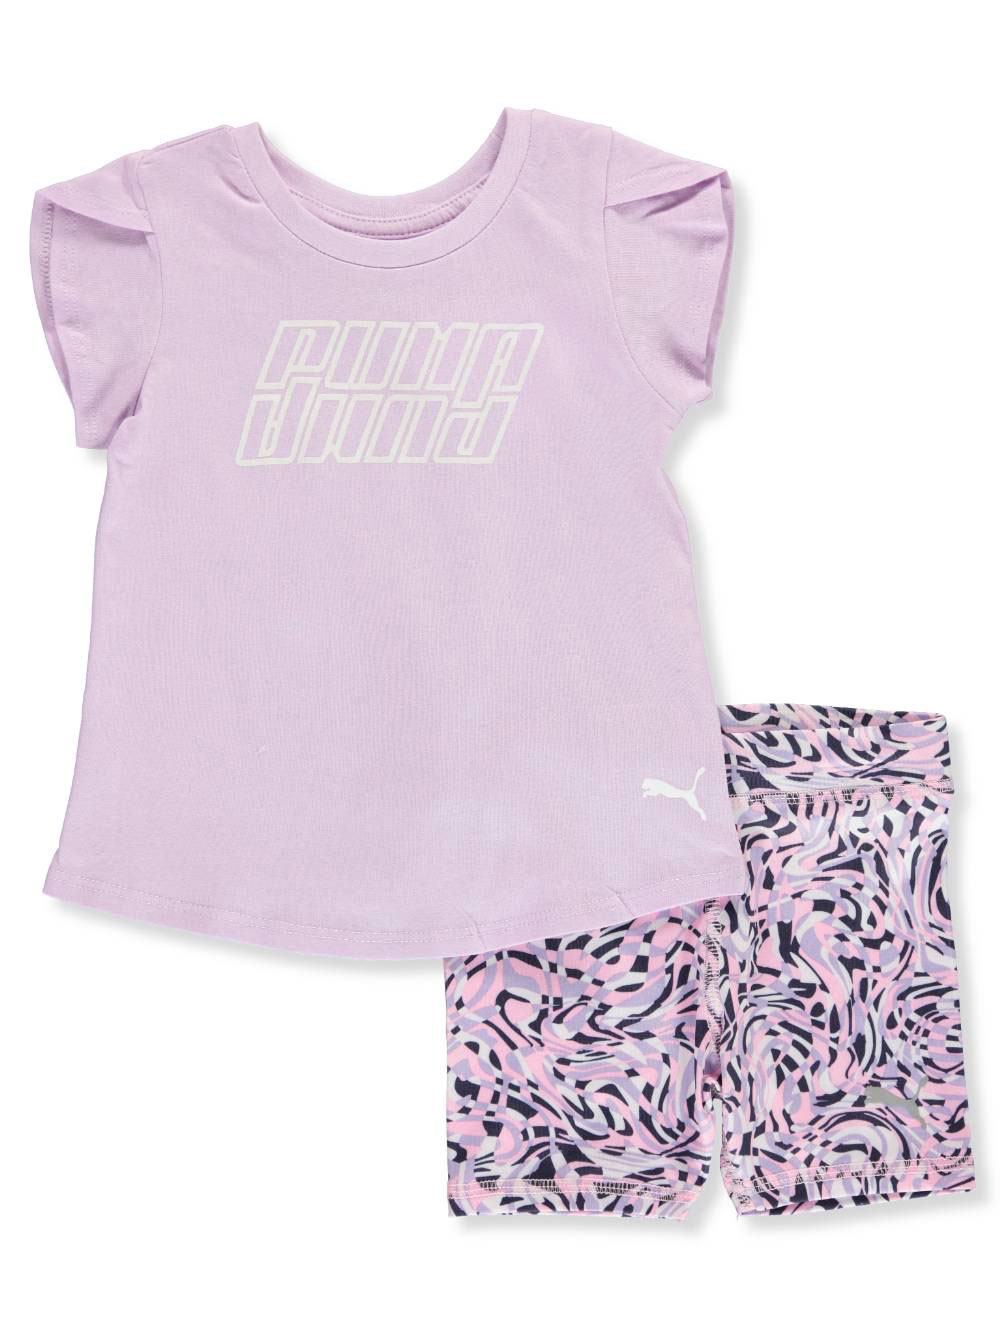 PUMA Girls Top and Tulle Skort Set